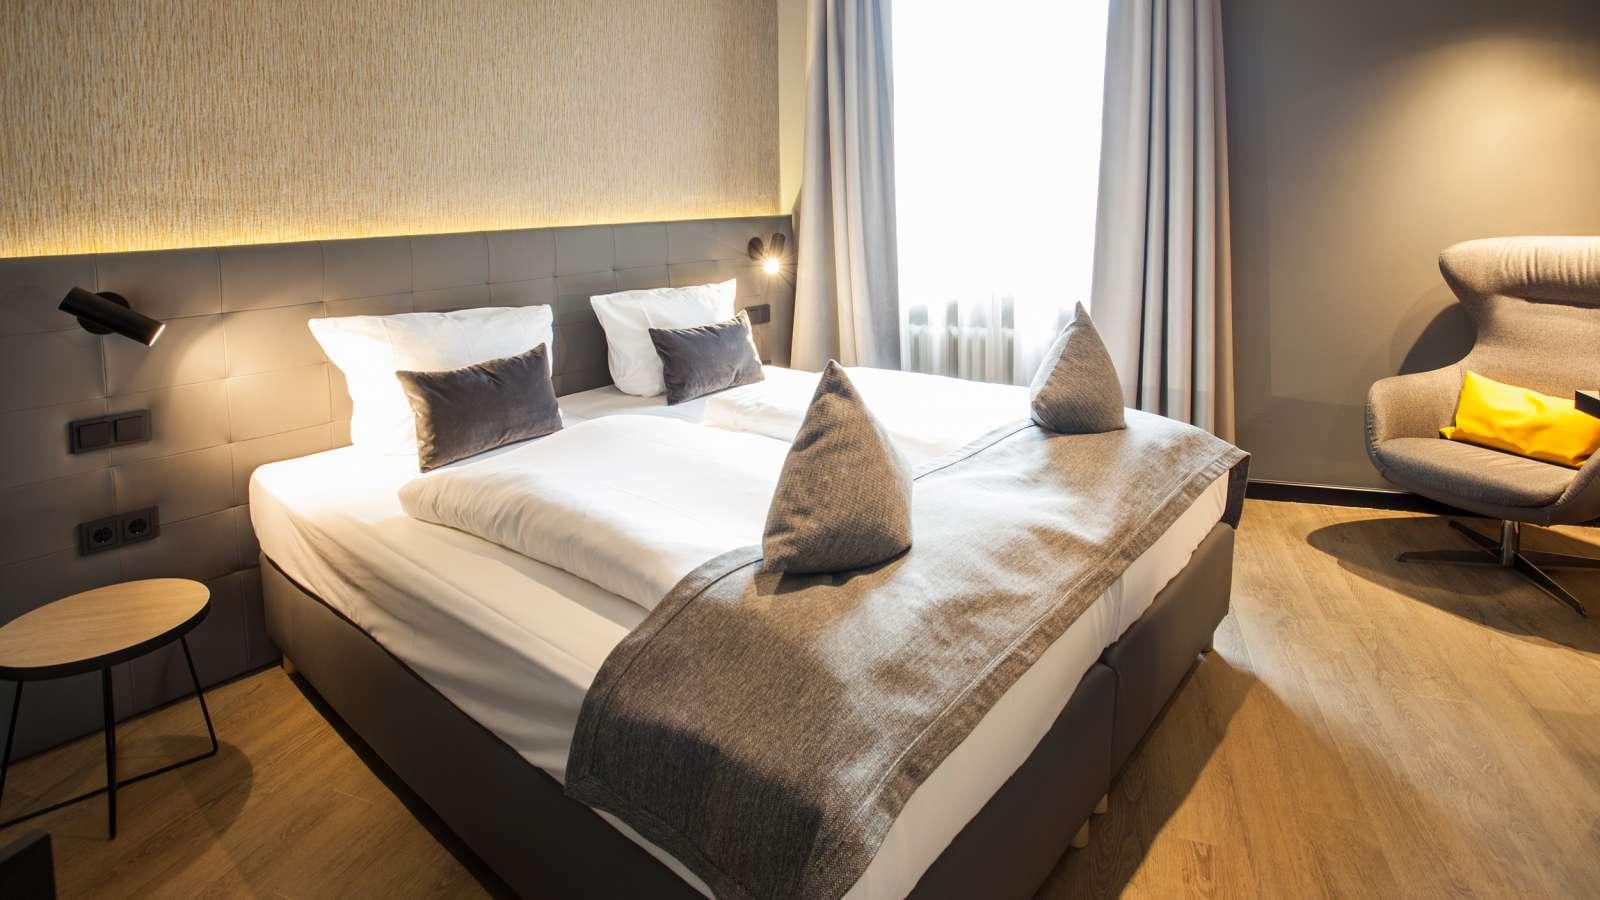 Centro Hotels News Boutique 102 Dortmund City